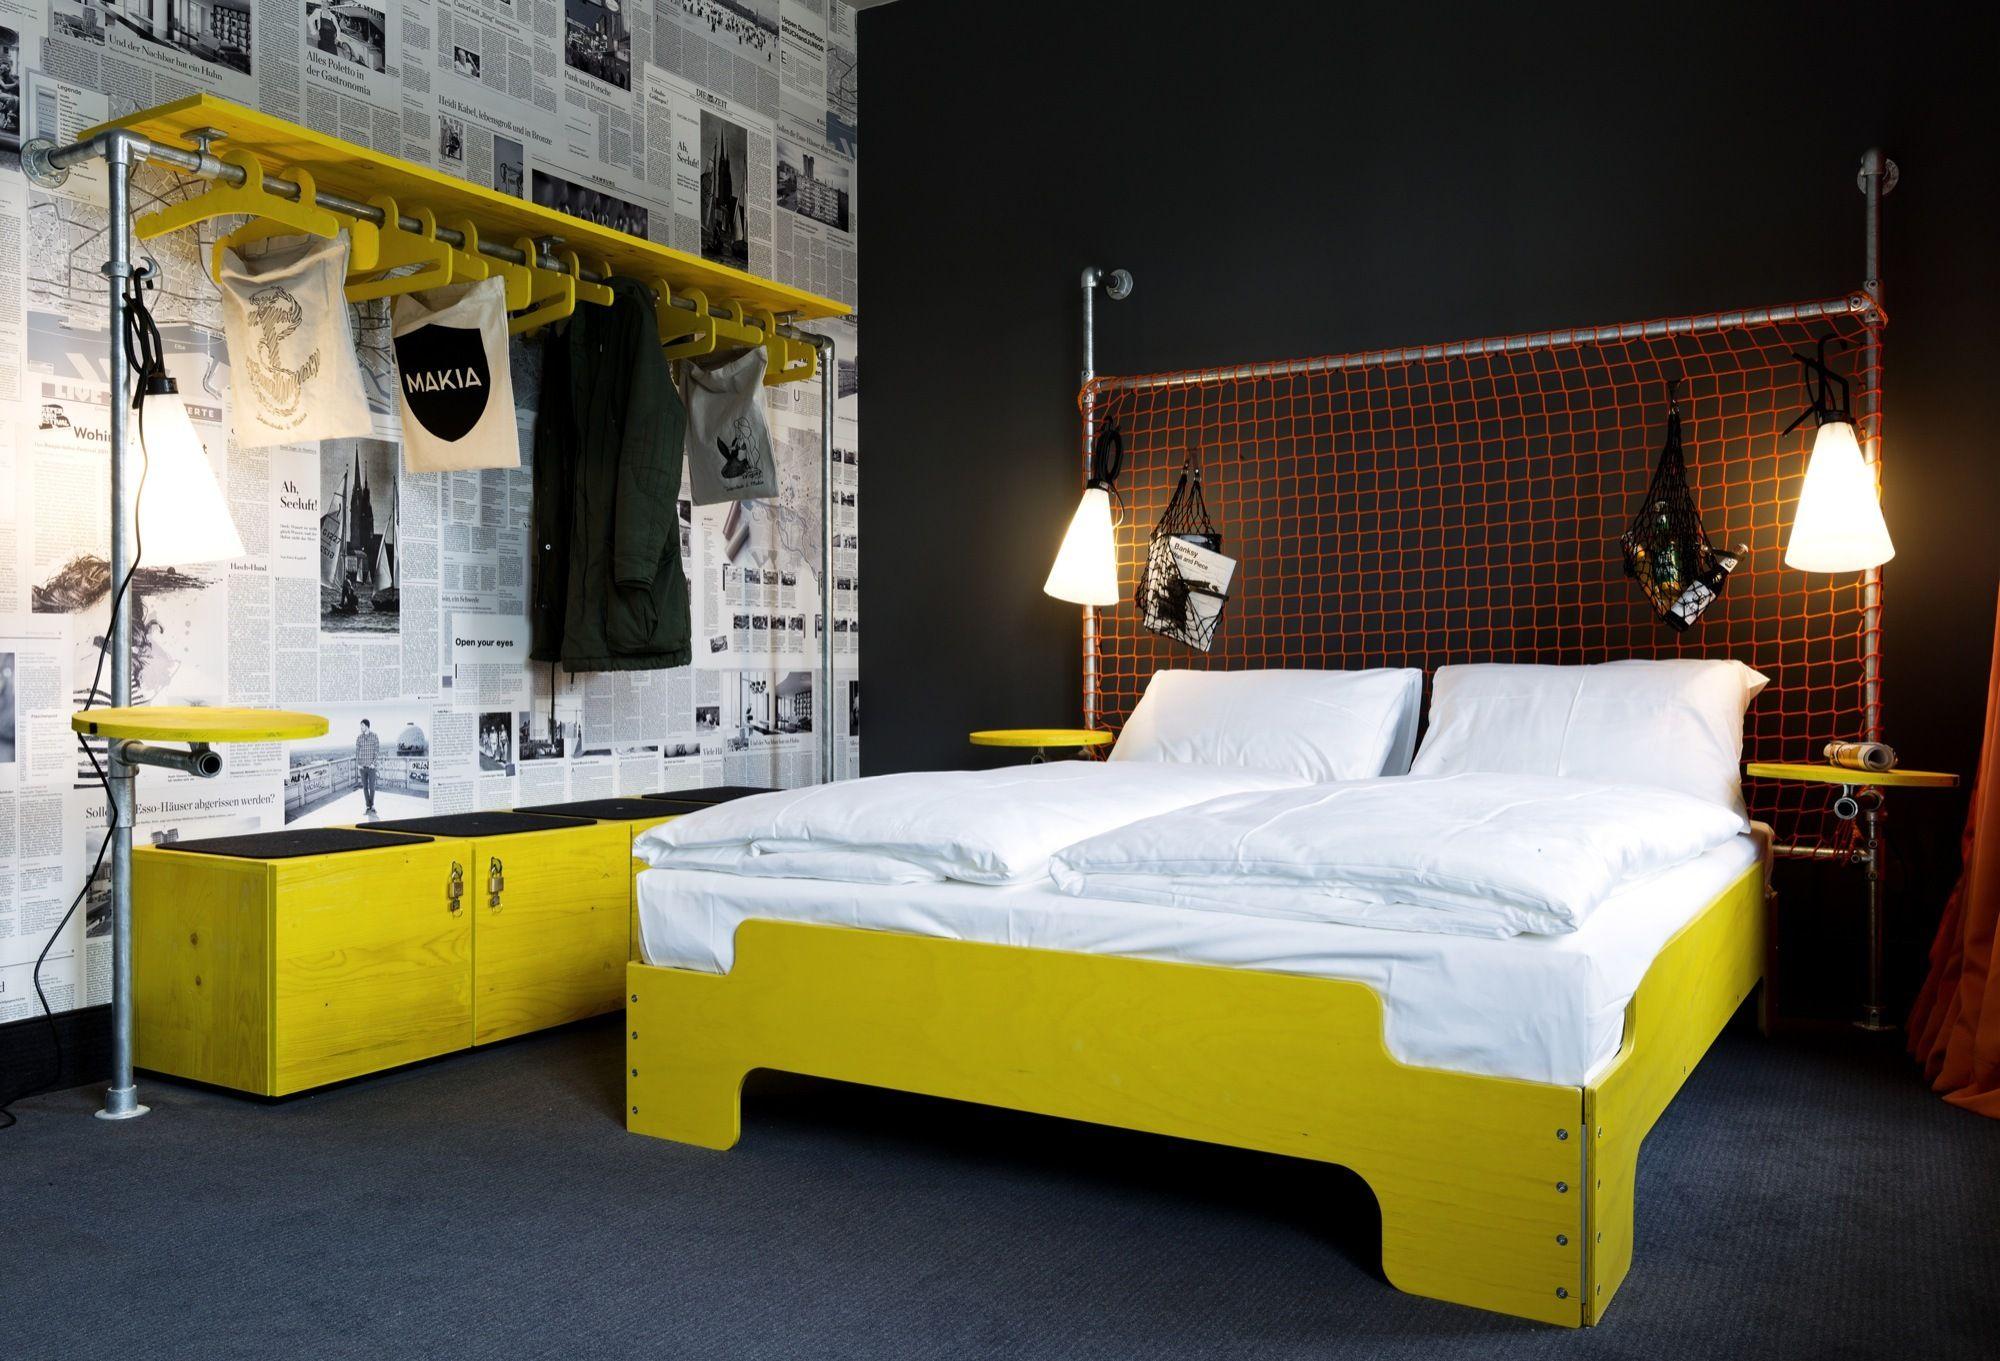 2 bedroom interior design 호텔superbude   dreimeta  boutique hotel  pinterest  guest